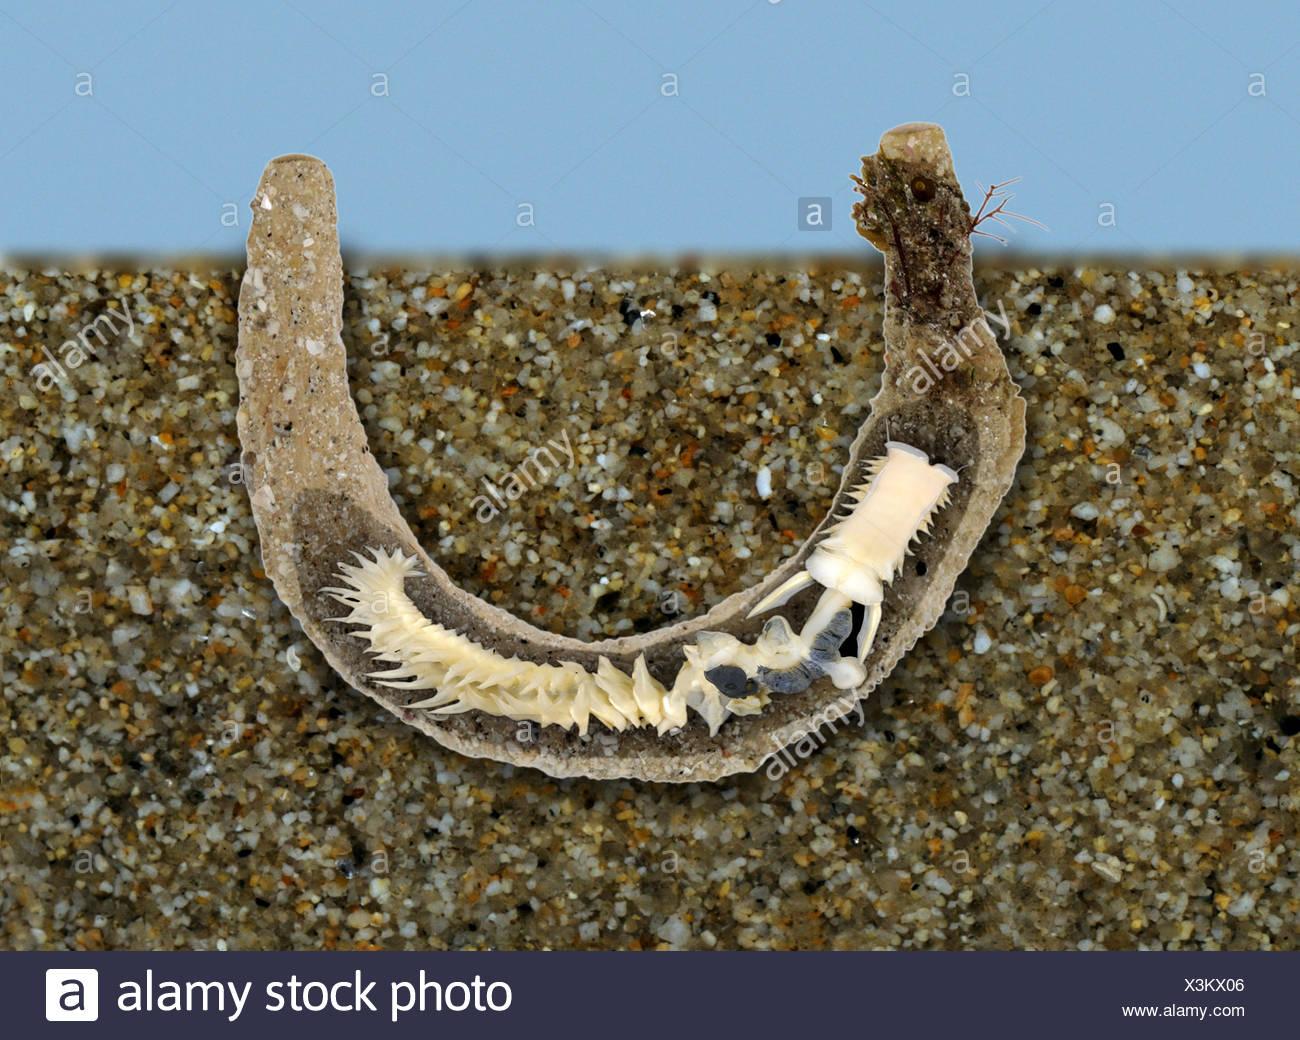 Parchment Worm - Chaetopterus variopedatus - Stock Image